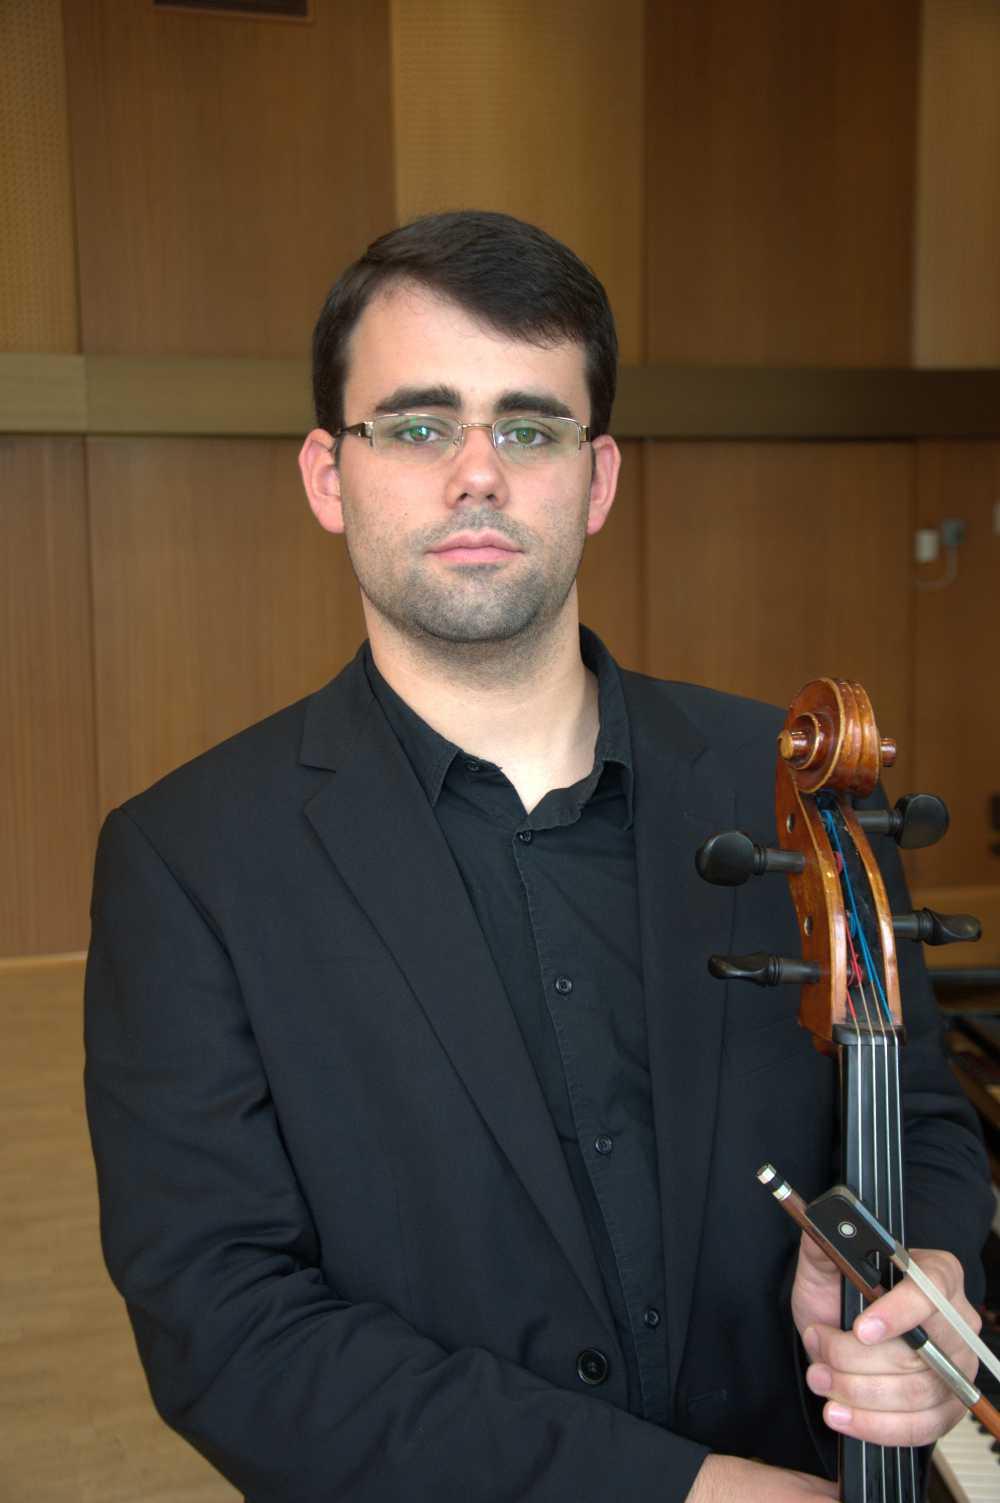 Florian Andreas Giesa